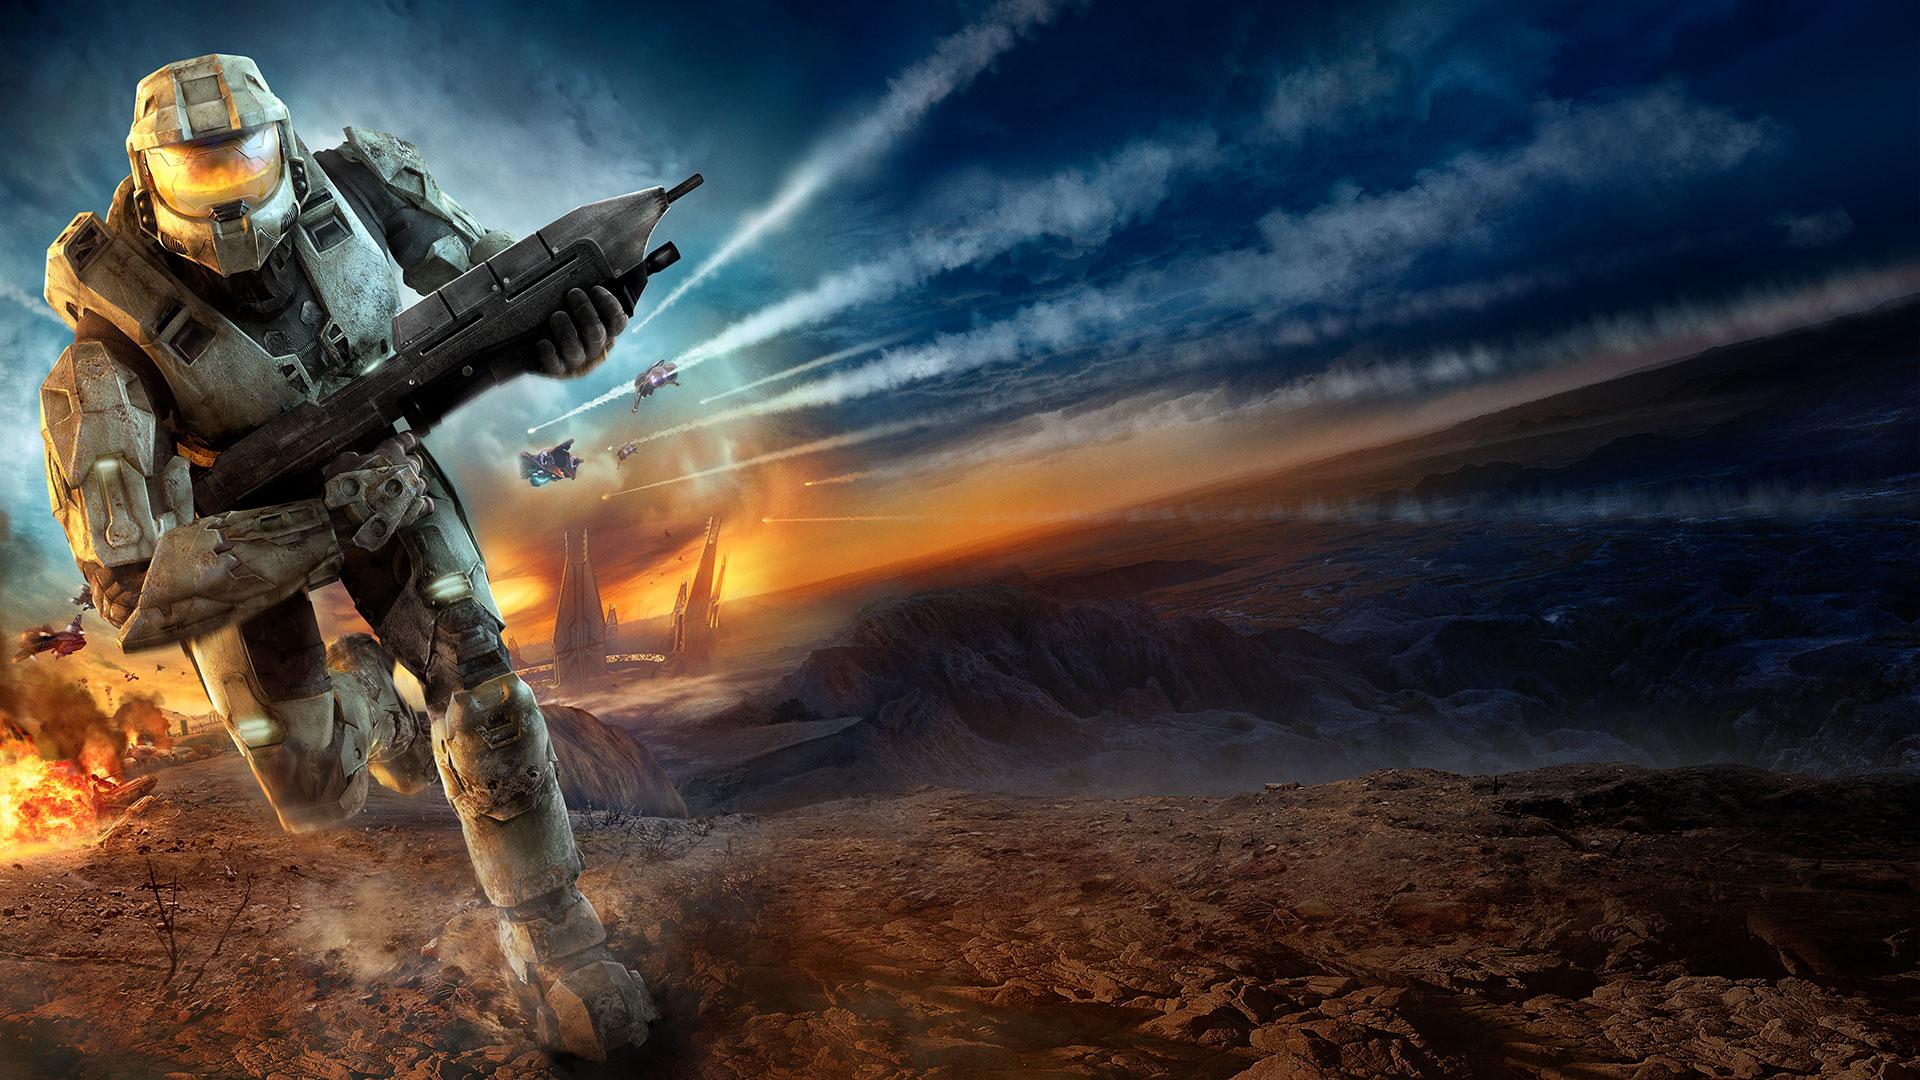 Halo 3 artwork of Master Chief running